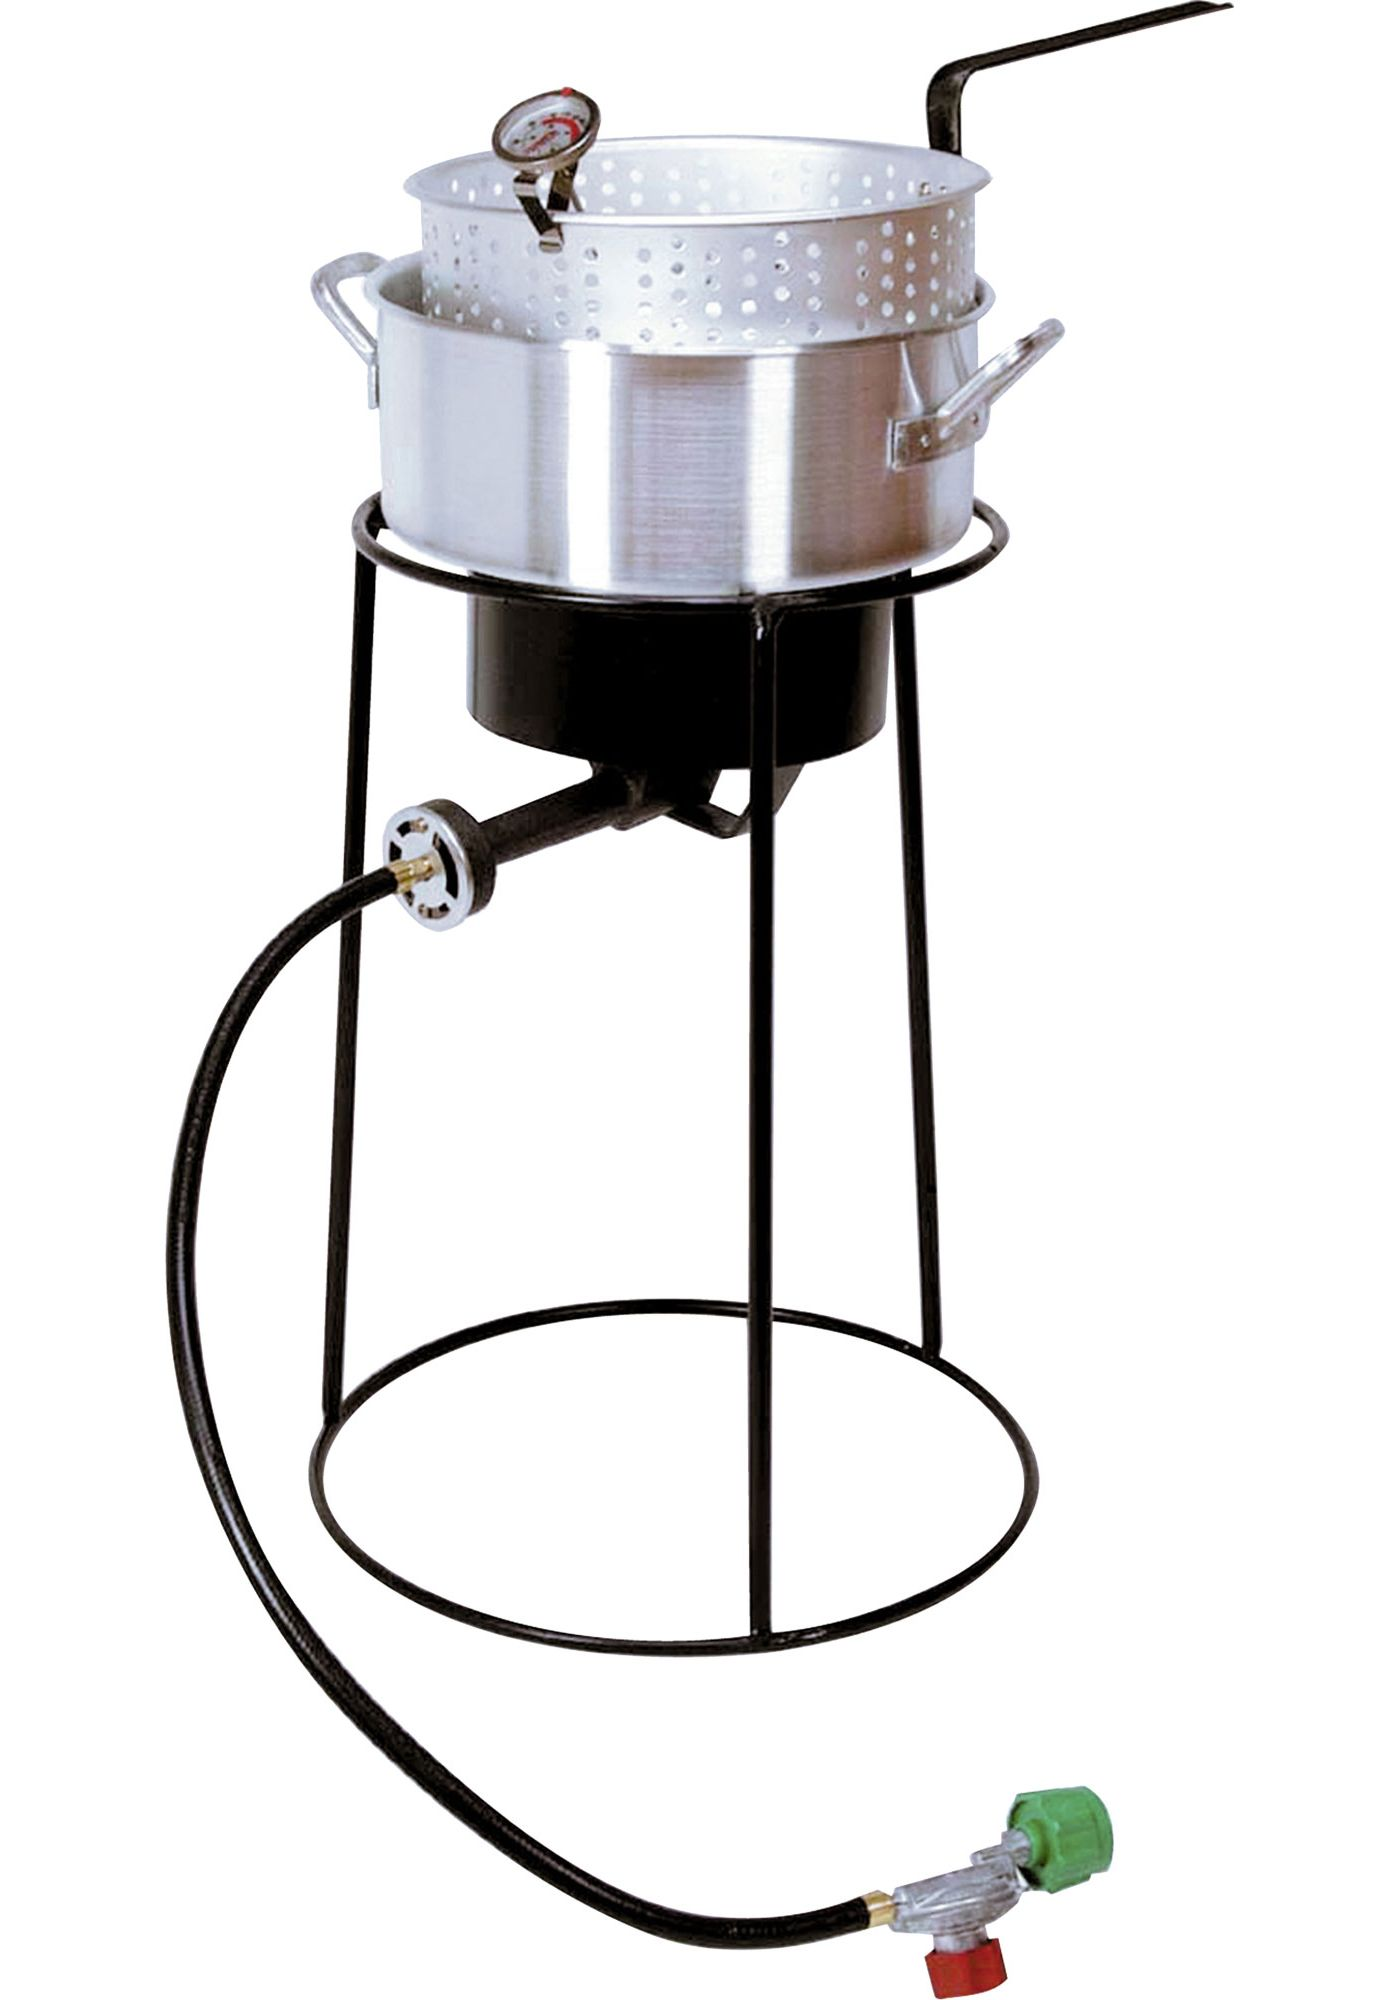 "King Kooker 20"" Fish Fryer Package with 10 Quart Aluminum Deep Fryer"